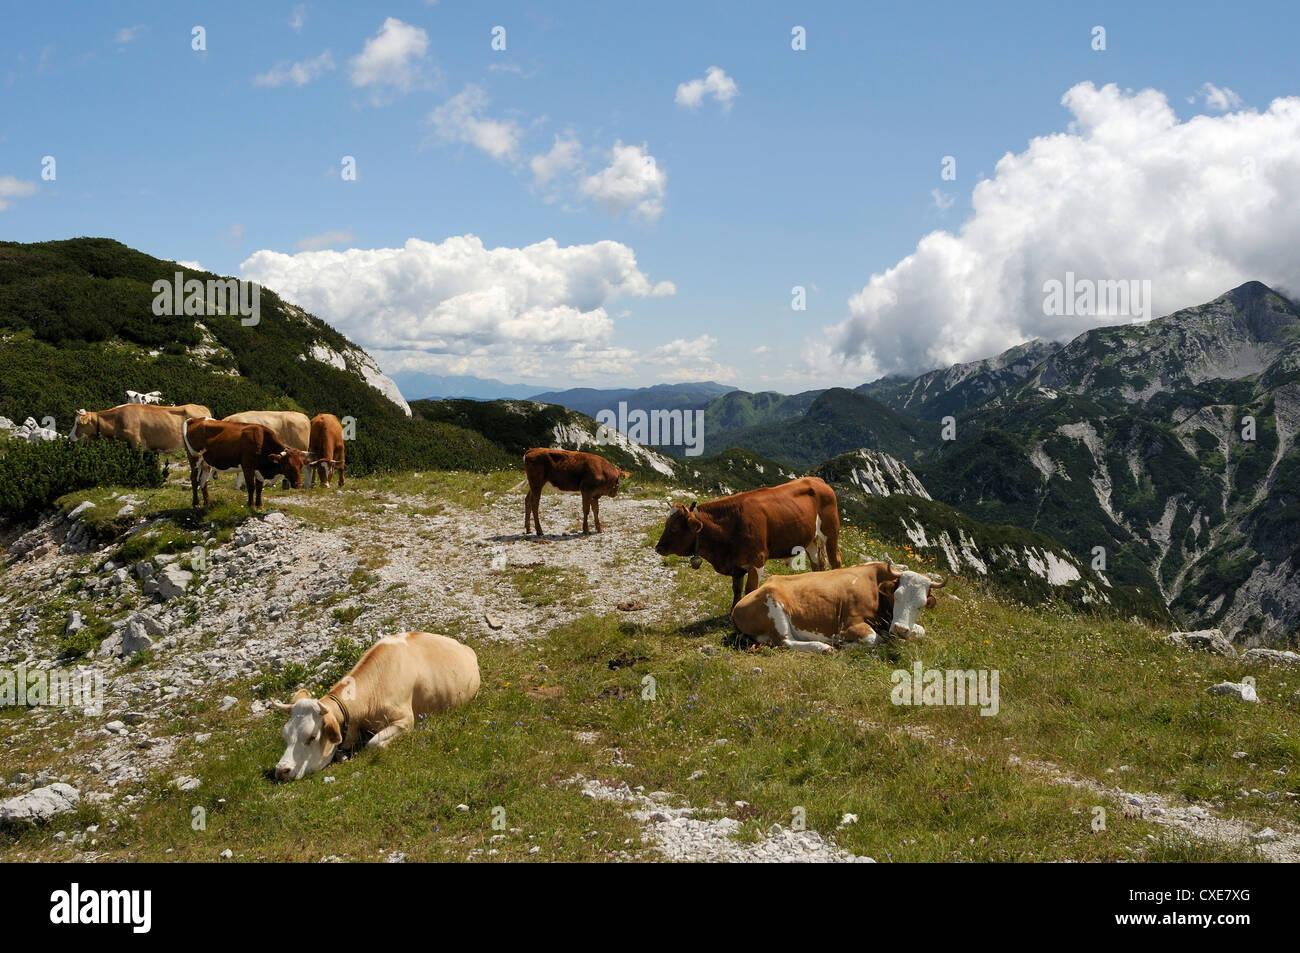 Small herd of Cows (Bos taurus) on alpine pastureland in the Julian Alps, Triglav National Park, slovenia, slovenianan - Stock Image